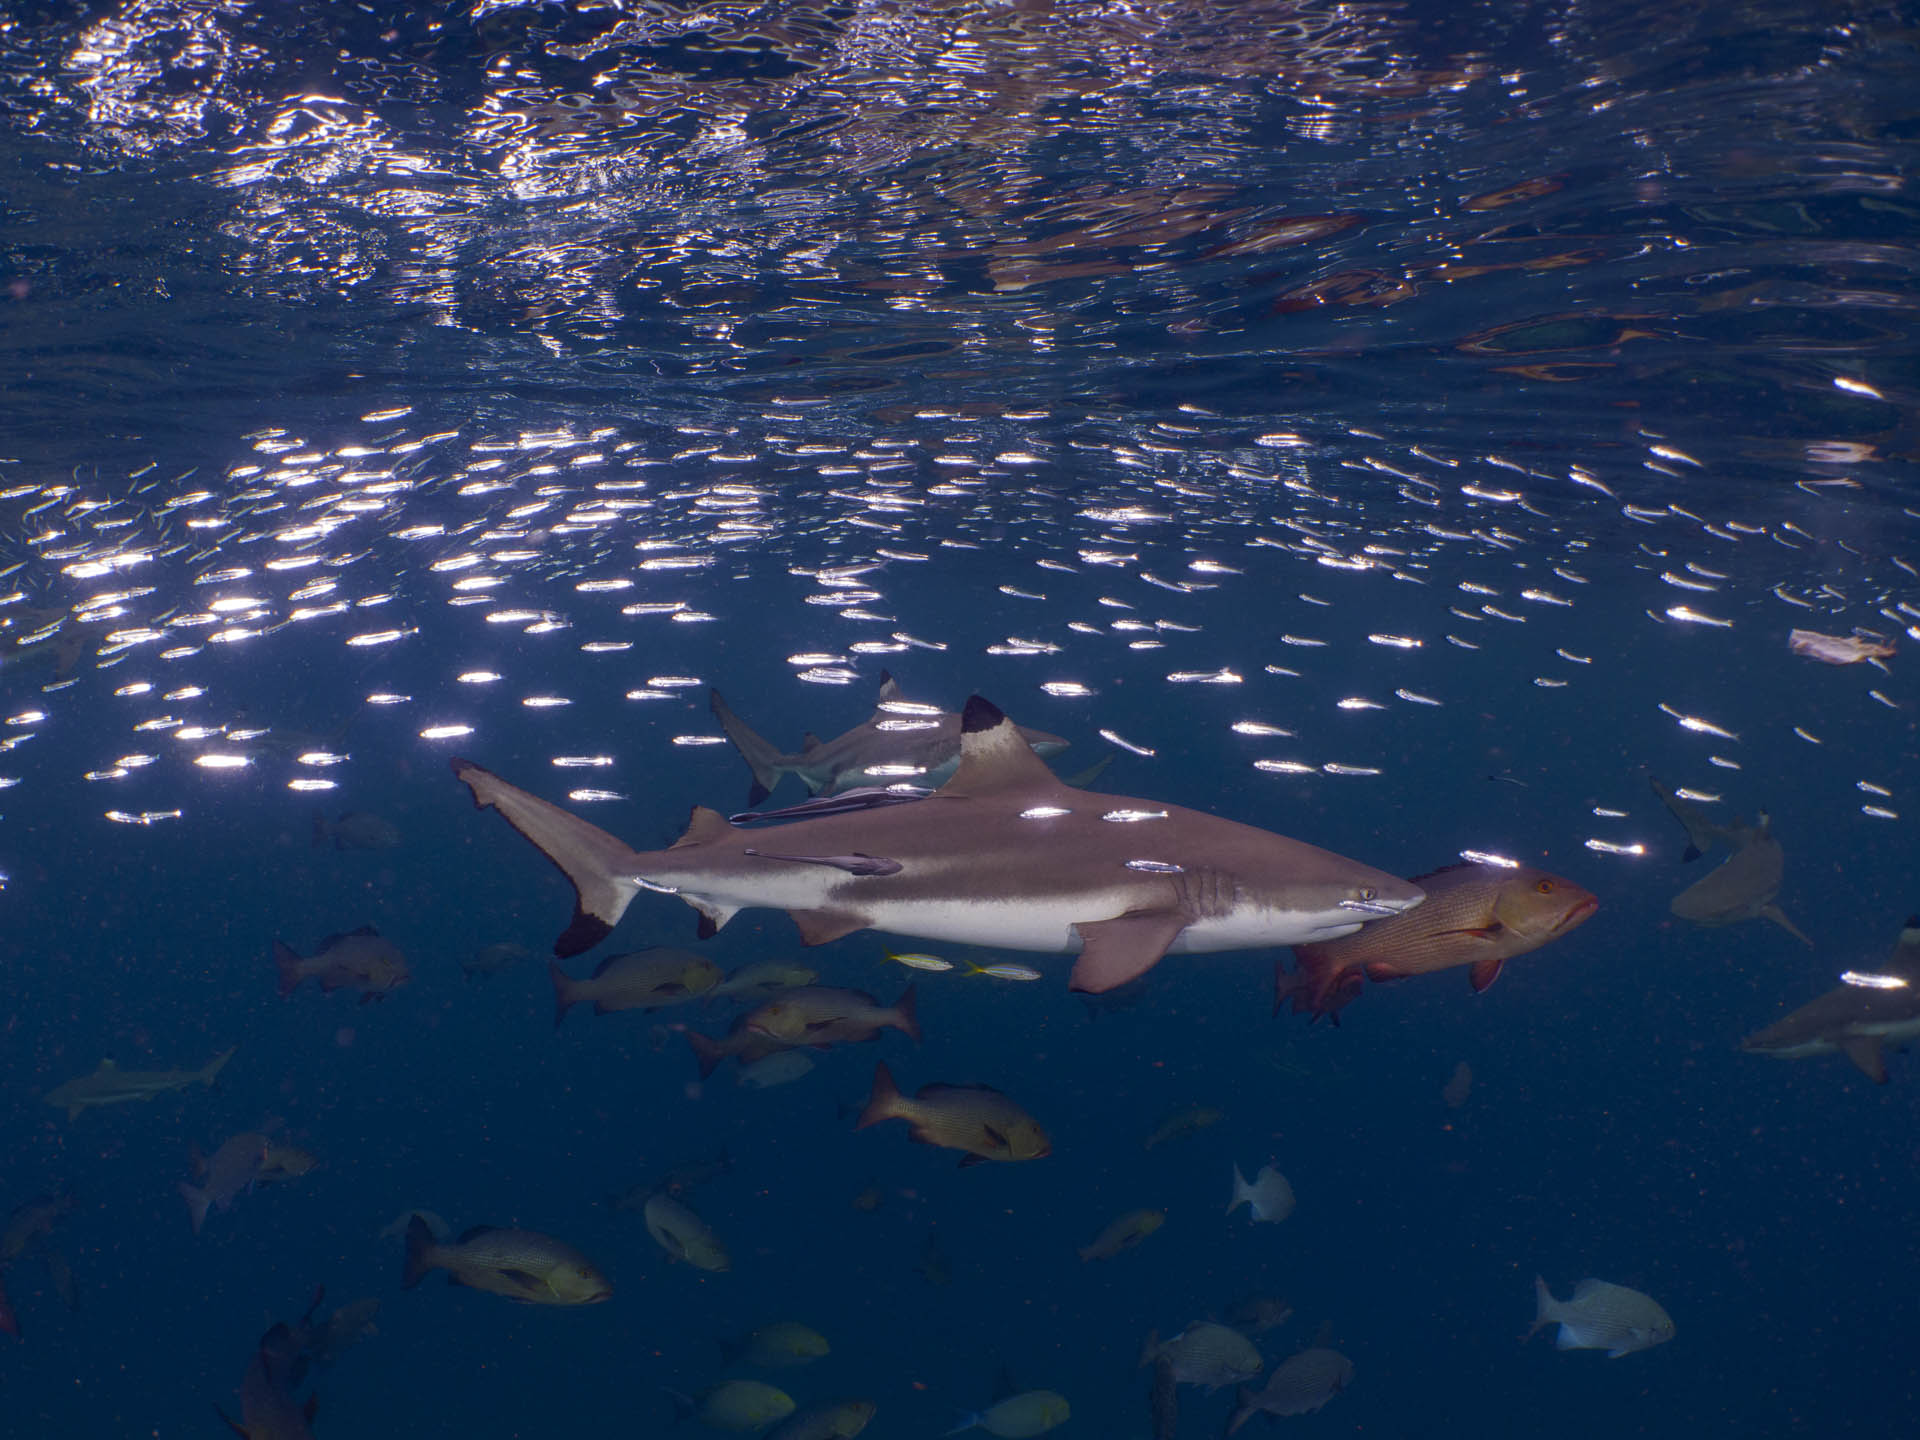 blacktip reef shark swimming through a school of fish